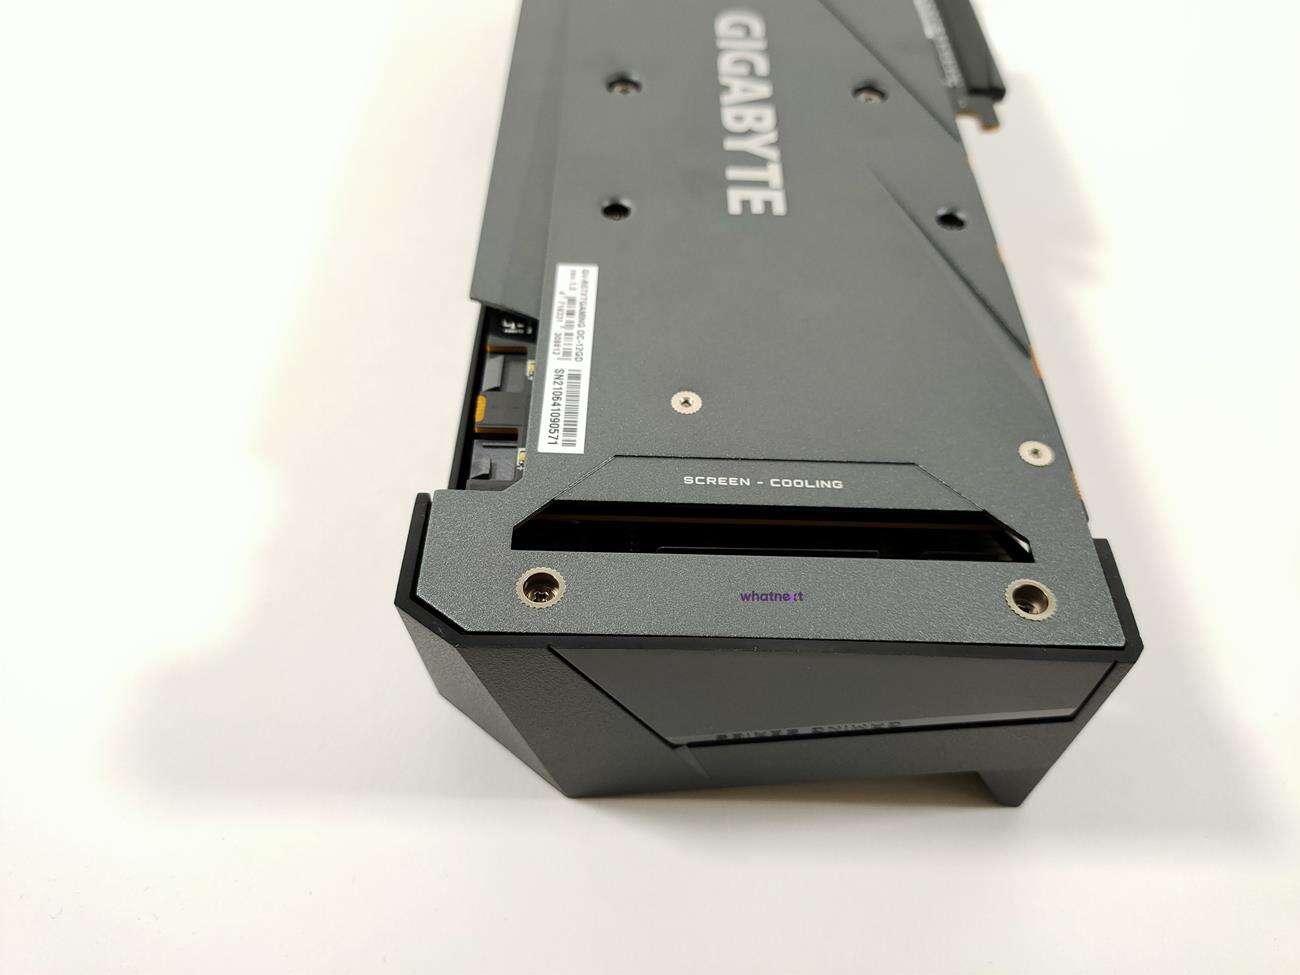 test Gigabyte Radeon RX 6700 XT Gaming OC 12G, recenzja Gigabyte Radeon RX 6700 XT Gaming OC 12G, opinia Gigabyte Radeon RX 6700 XT Gaming OC 12G